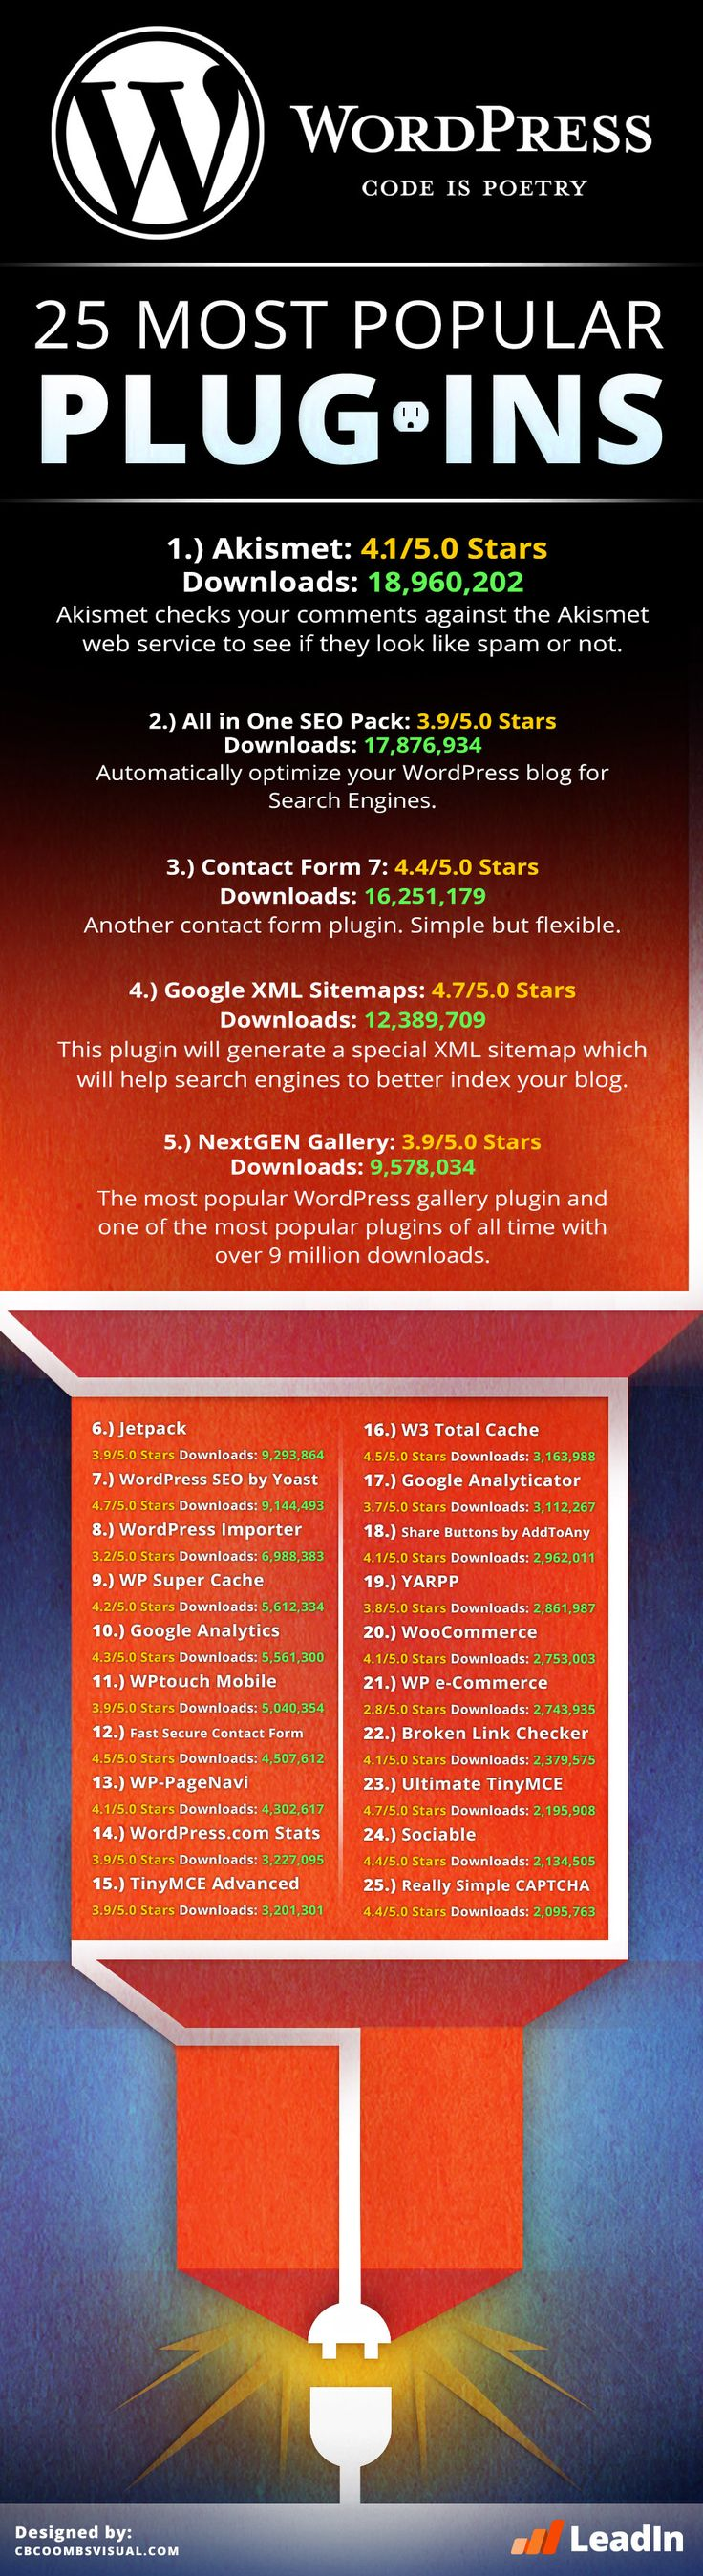 The Top 25 WordPress Plugins - Jeffbullas's Blog   #TheMarketingTechAlert